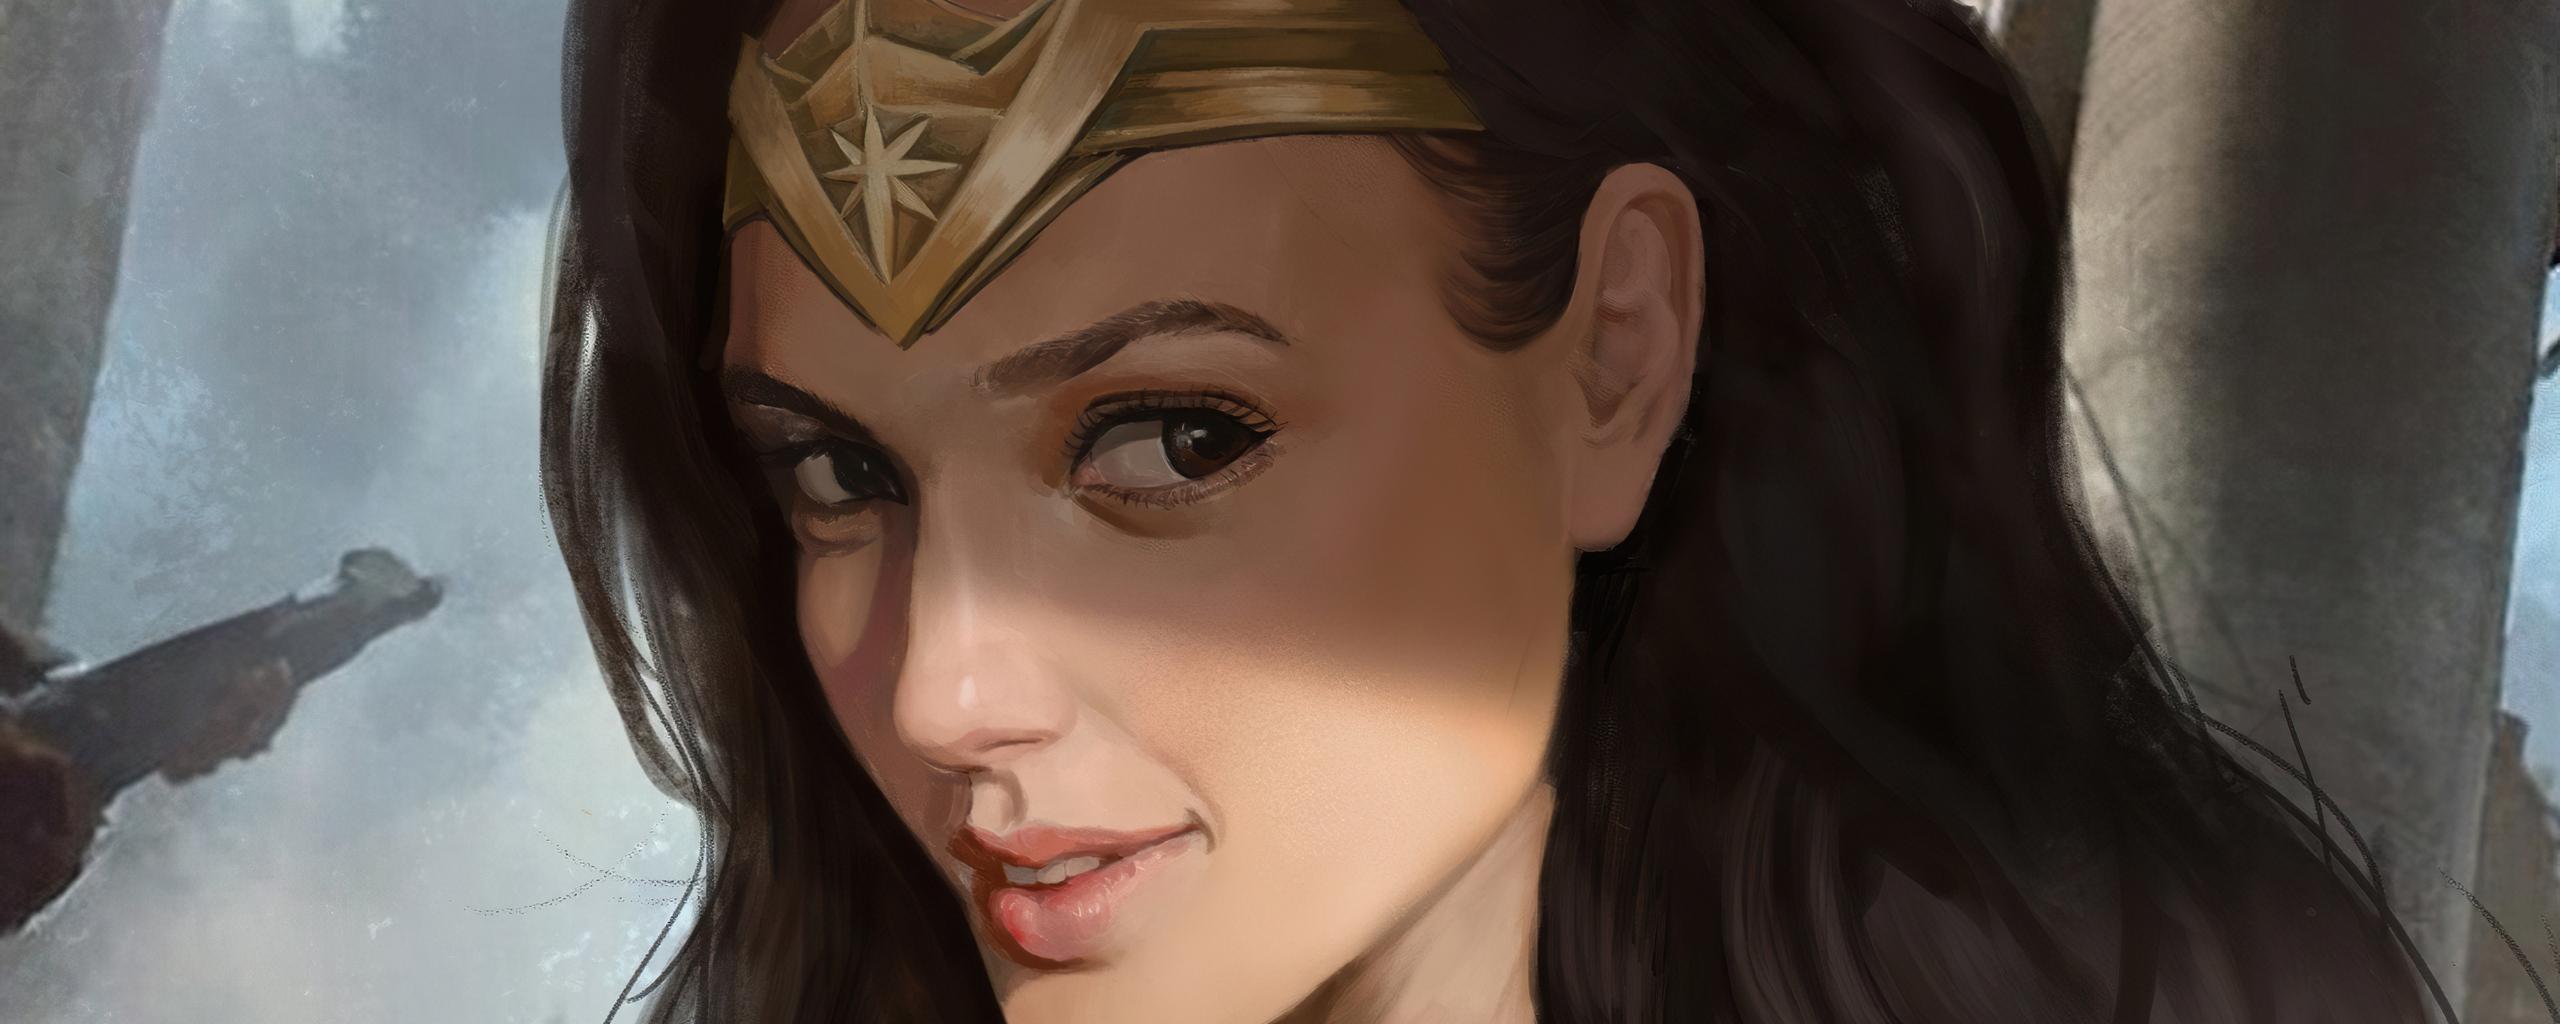 wonder-woman-closeup-m5.jpg